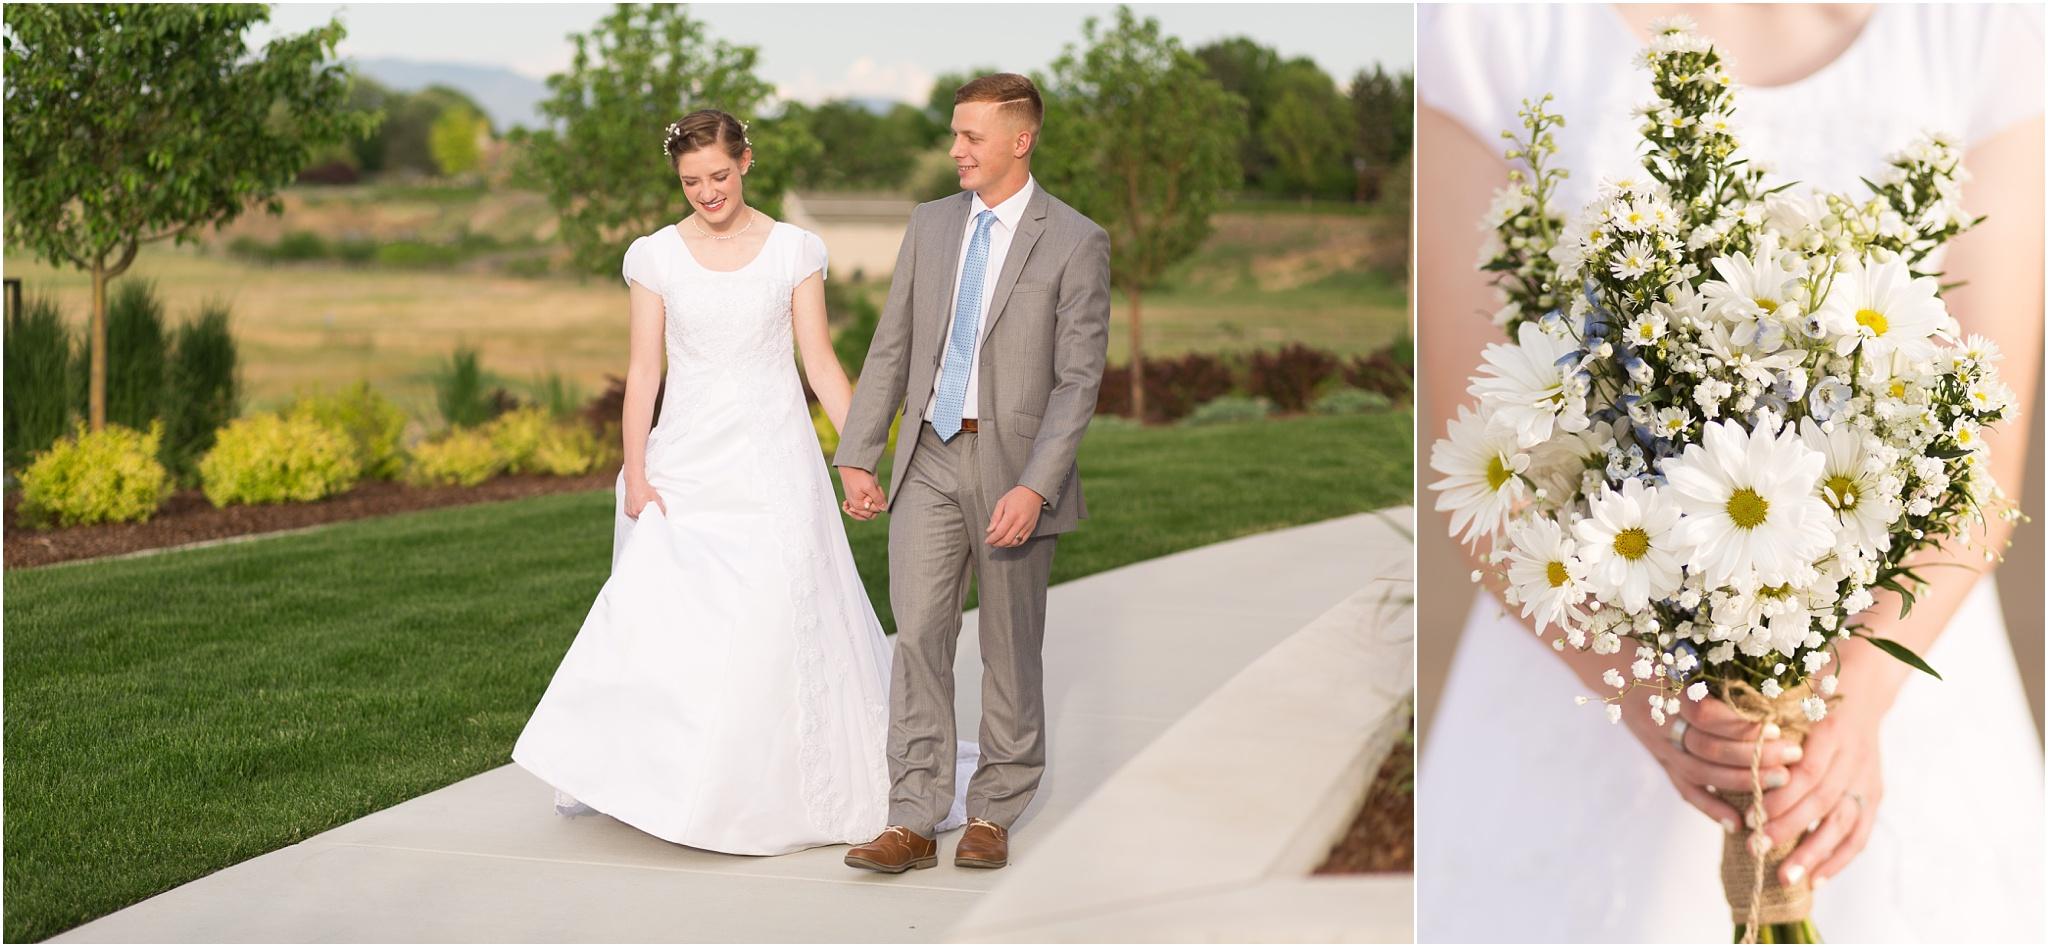 Wedding Photography_Meridian Idaho Temple_Boise Idaho_Leah Southwick Photography_0039.jpg